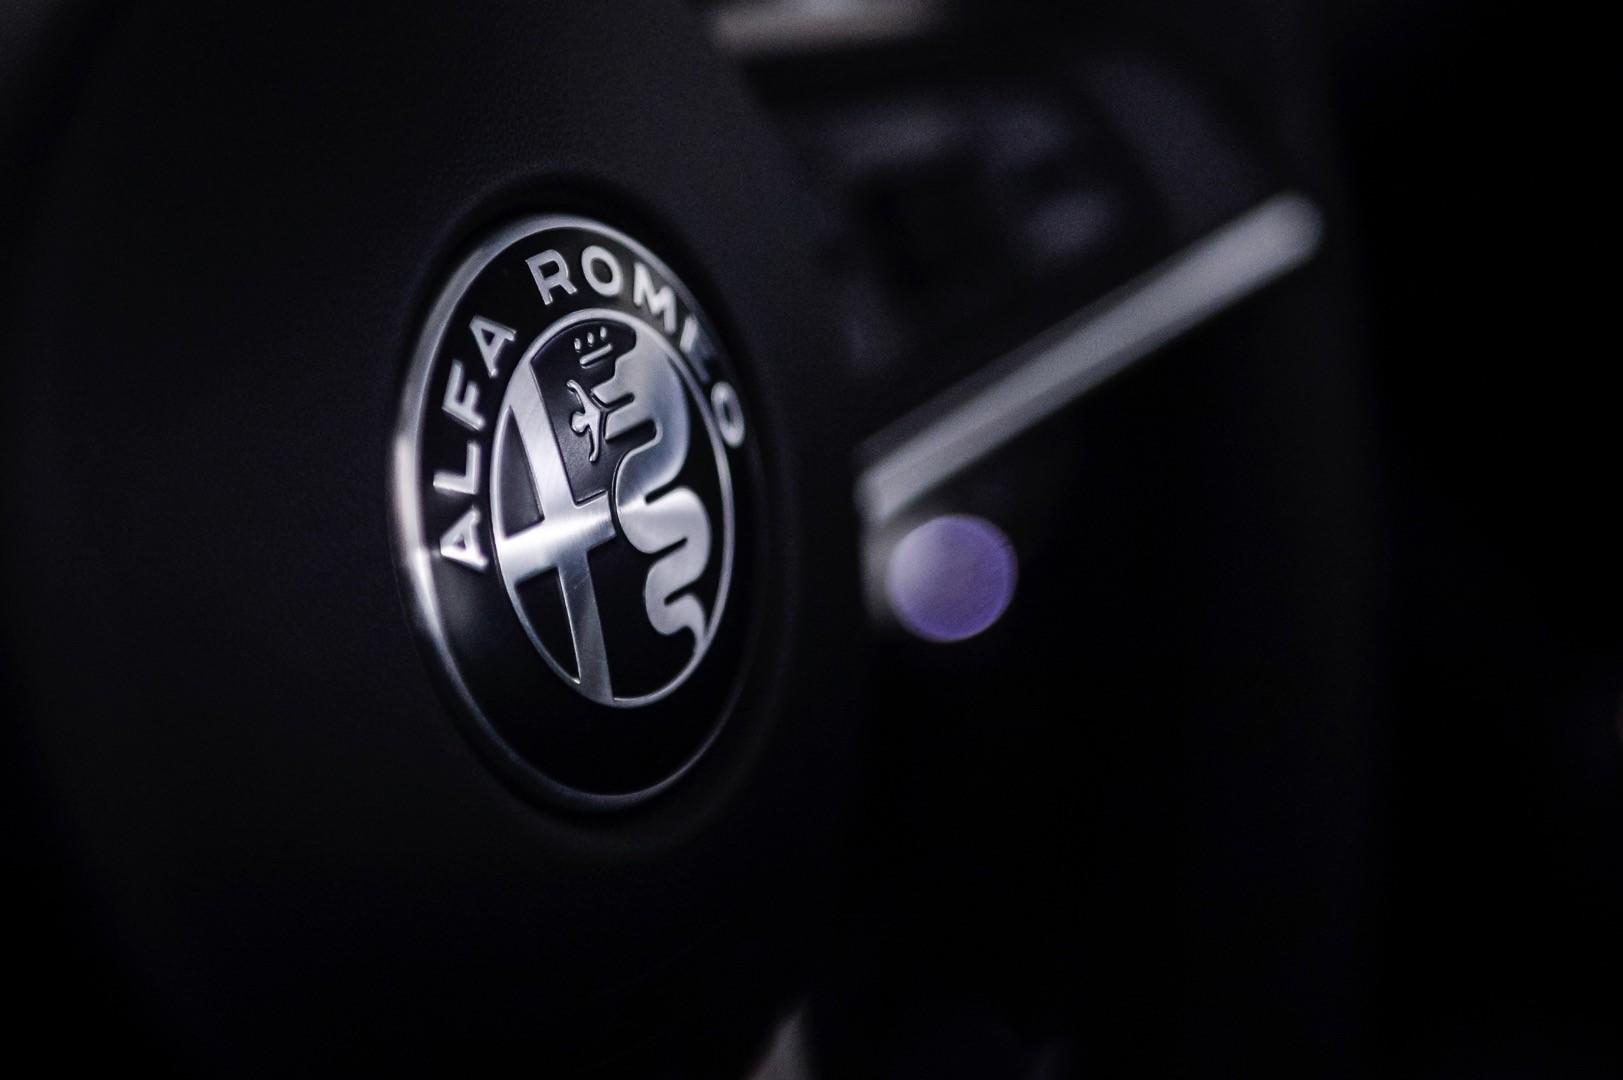 Alfa Romeo 1 Return Made Official By Sauber Deal - autoevolution on renault logo, bentley logo, lincoln logo, rolls royce logo, fiat logo, ferrari logo, honda logo, porsche logo, alpina logo, lamborghini logo, mercedes logo, mazda logo, peugeot logo, aston martin logo, lancia logo, bmw logo, amc logo, studebaker logo, maserati logo, ford logo,